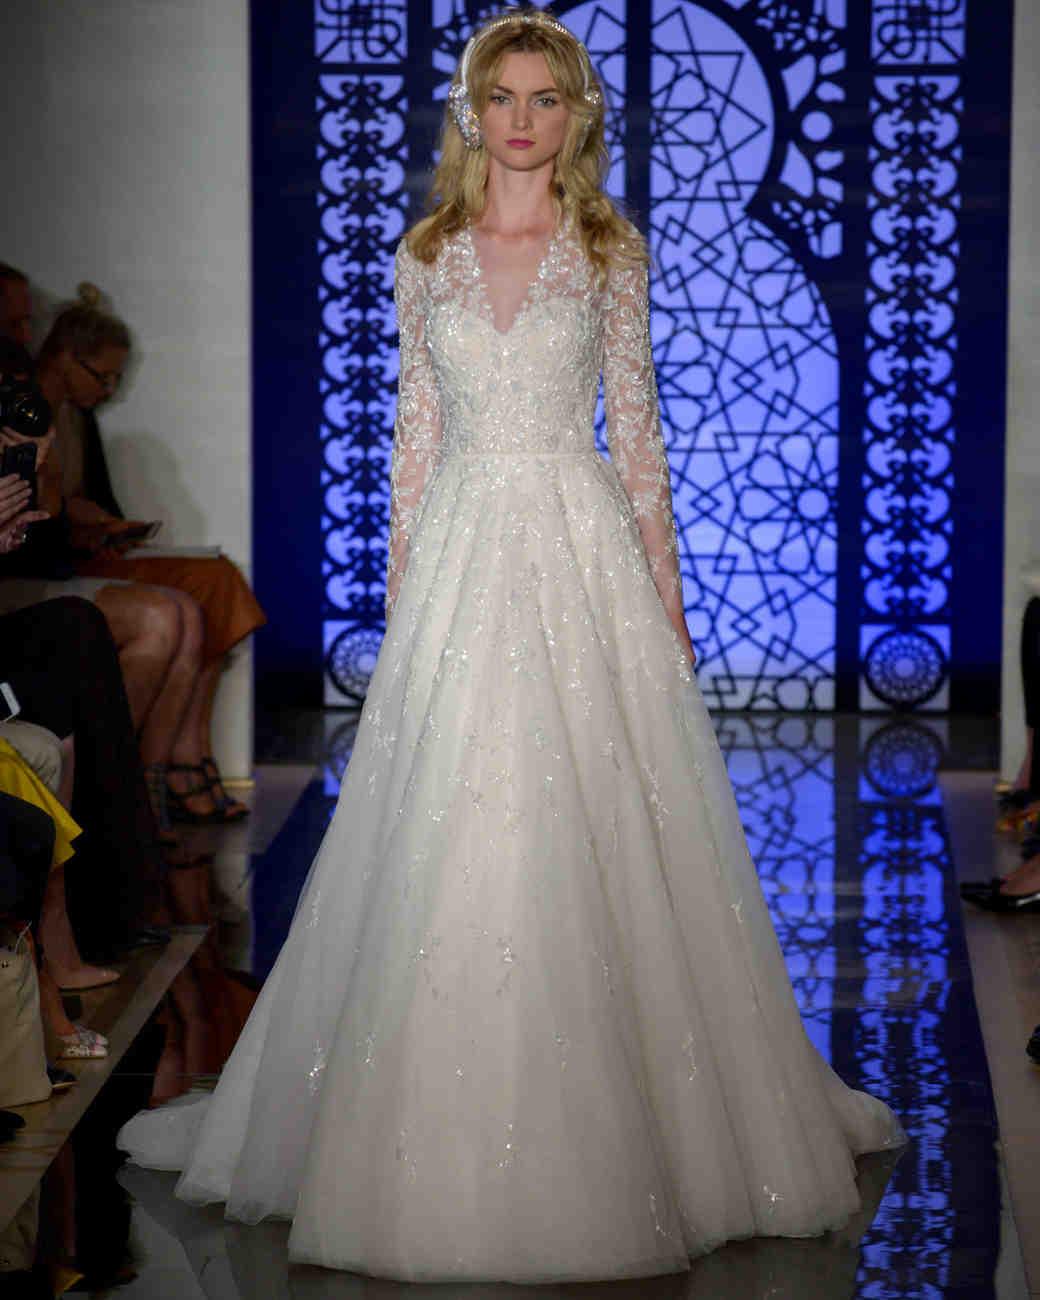 Reem Acra Wedding Dress: Reem Acra Fall 2016 Wedding Dress Collection